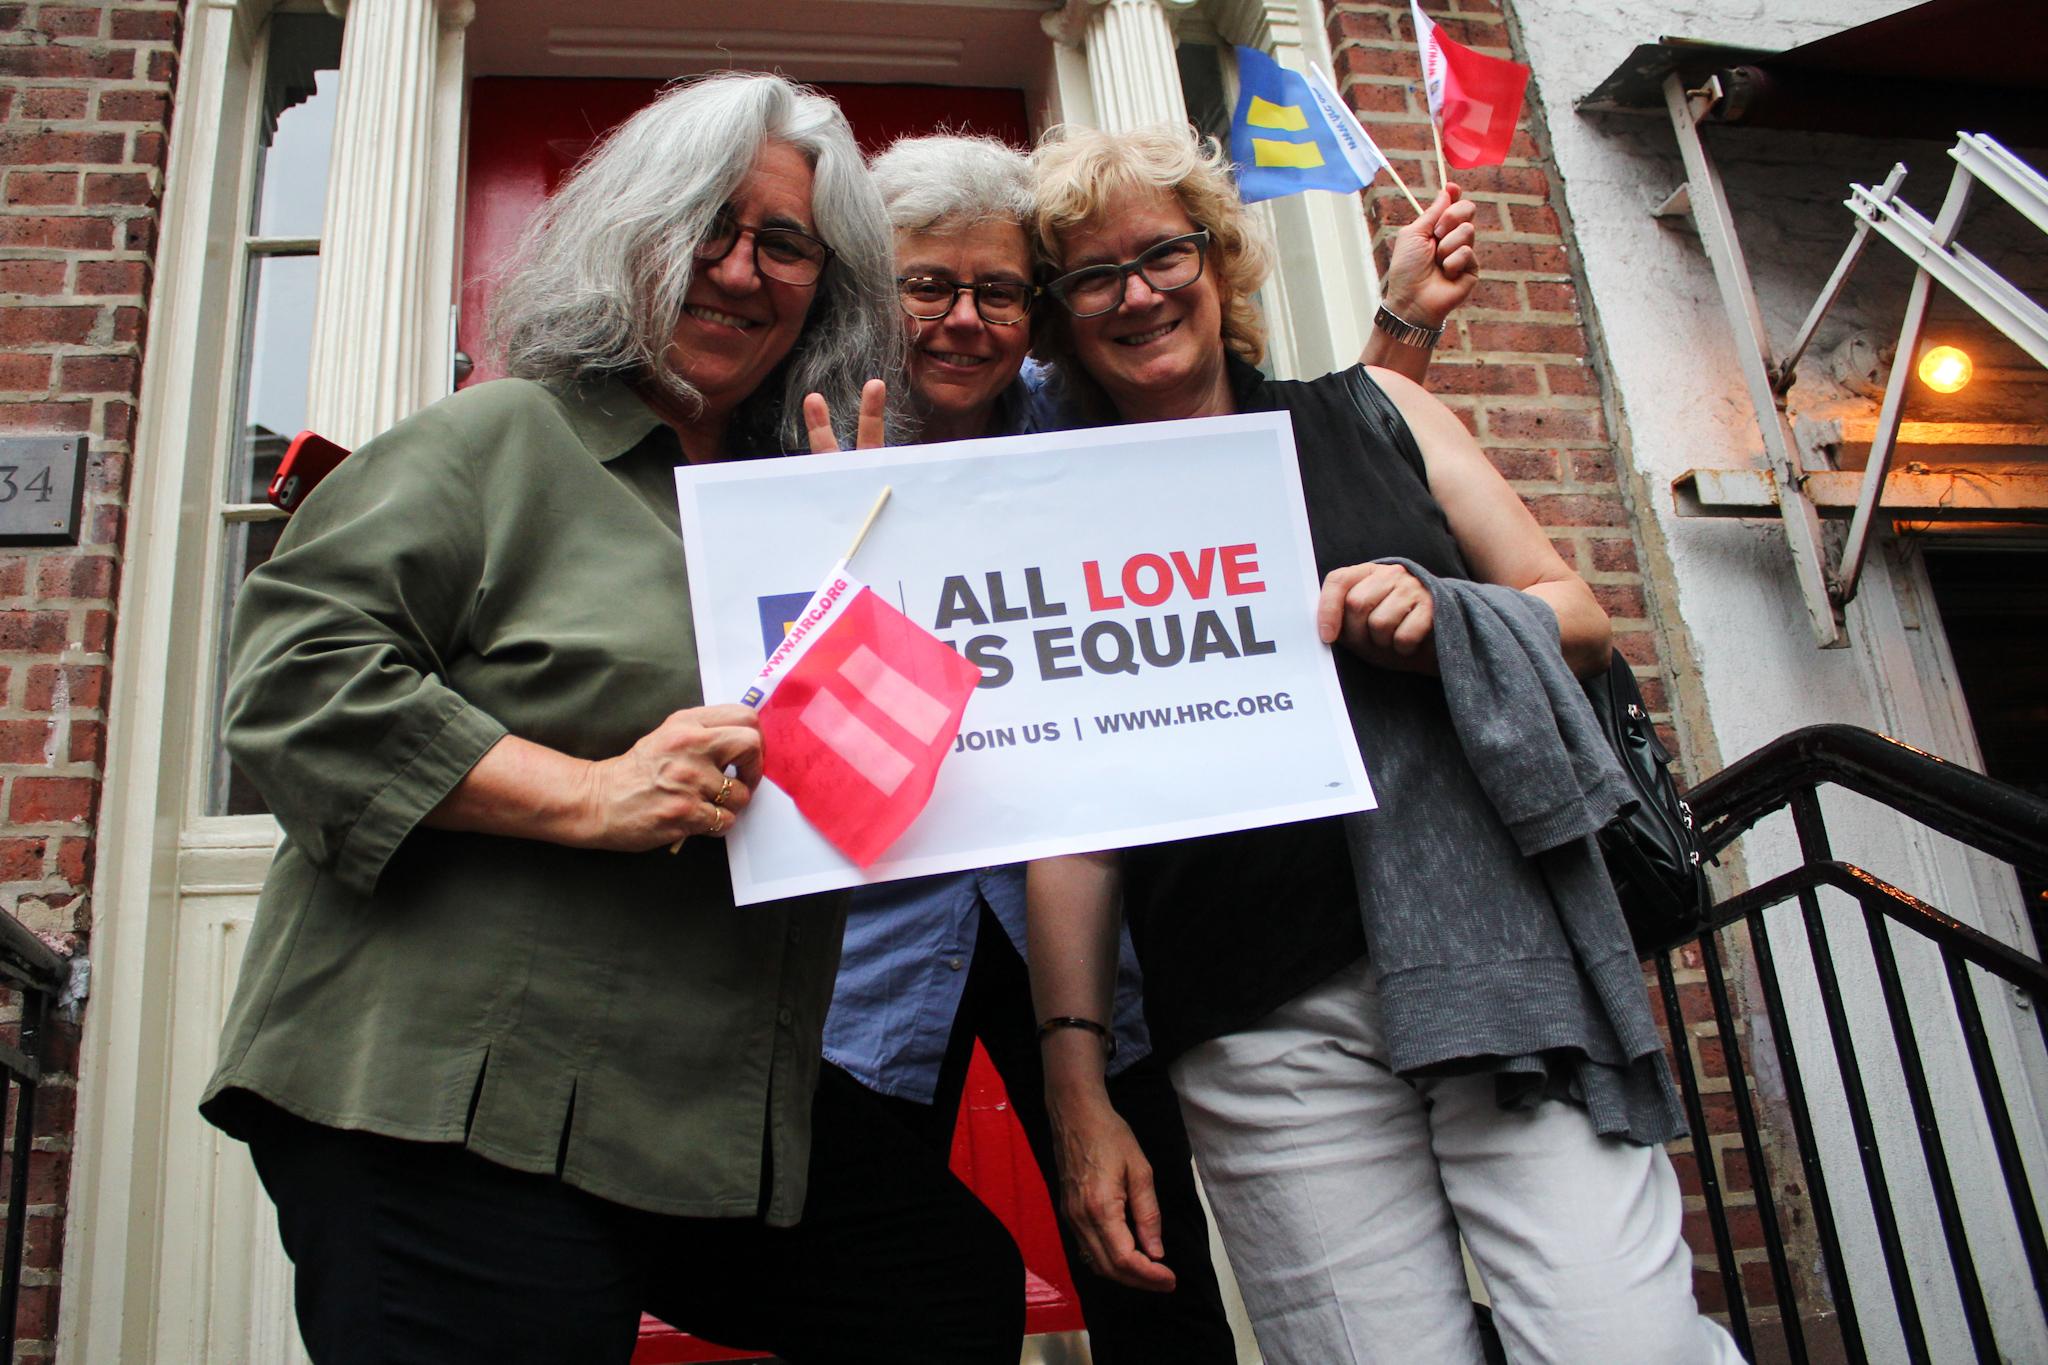 Gay Pride Photos: Celebrating DOMA's demise